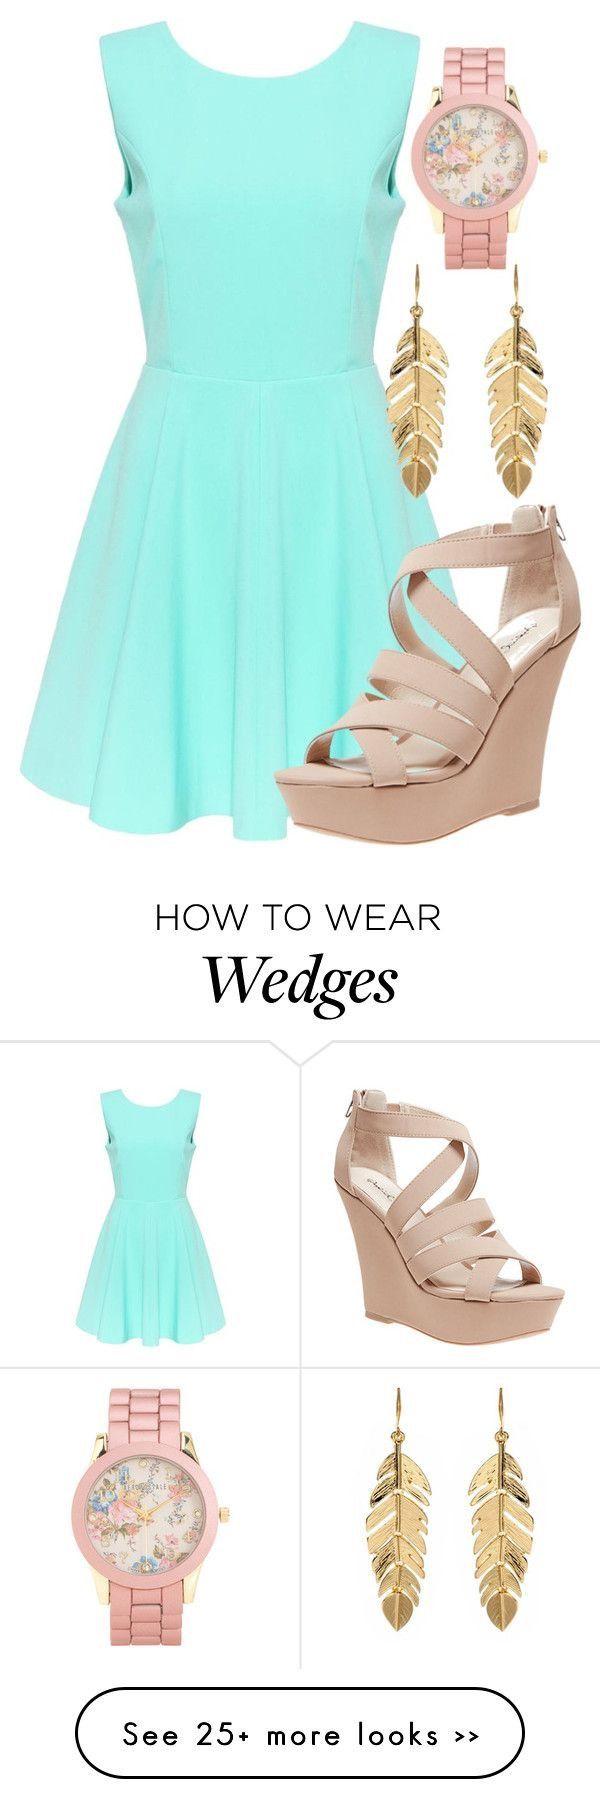 634 best Dresses images on Pinterest | Clothes, Graduation and ...